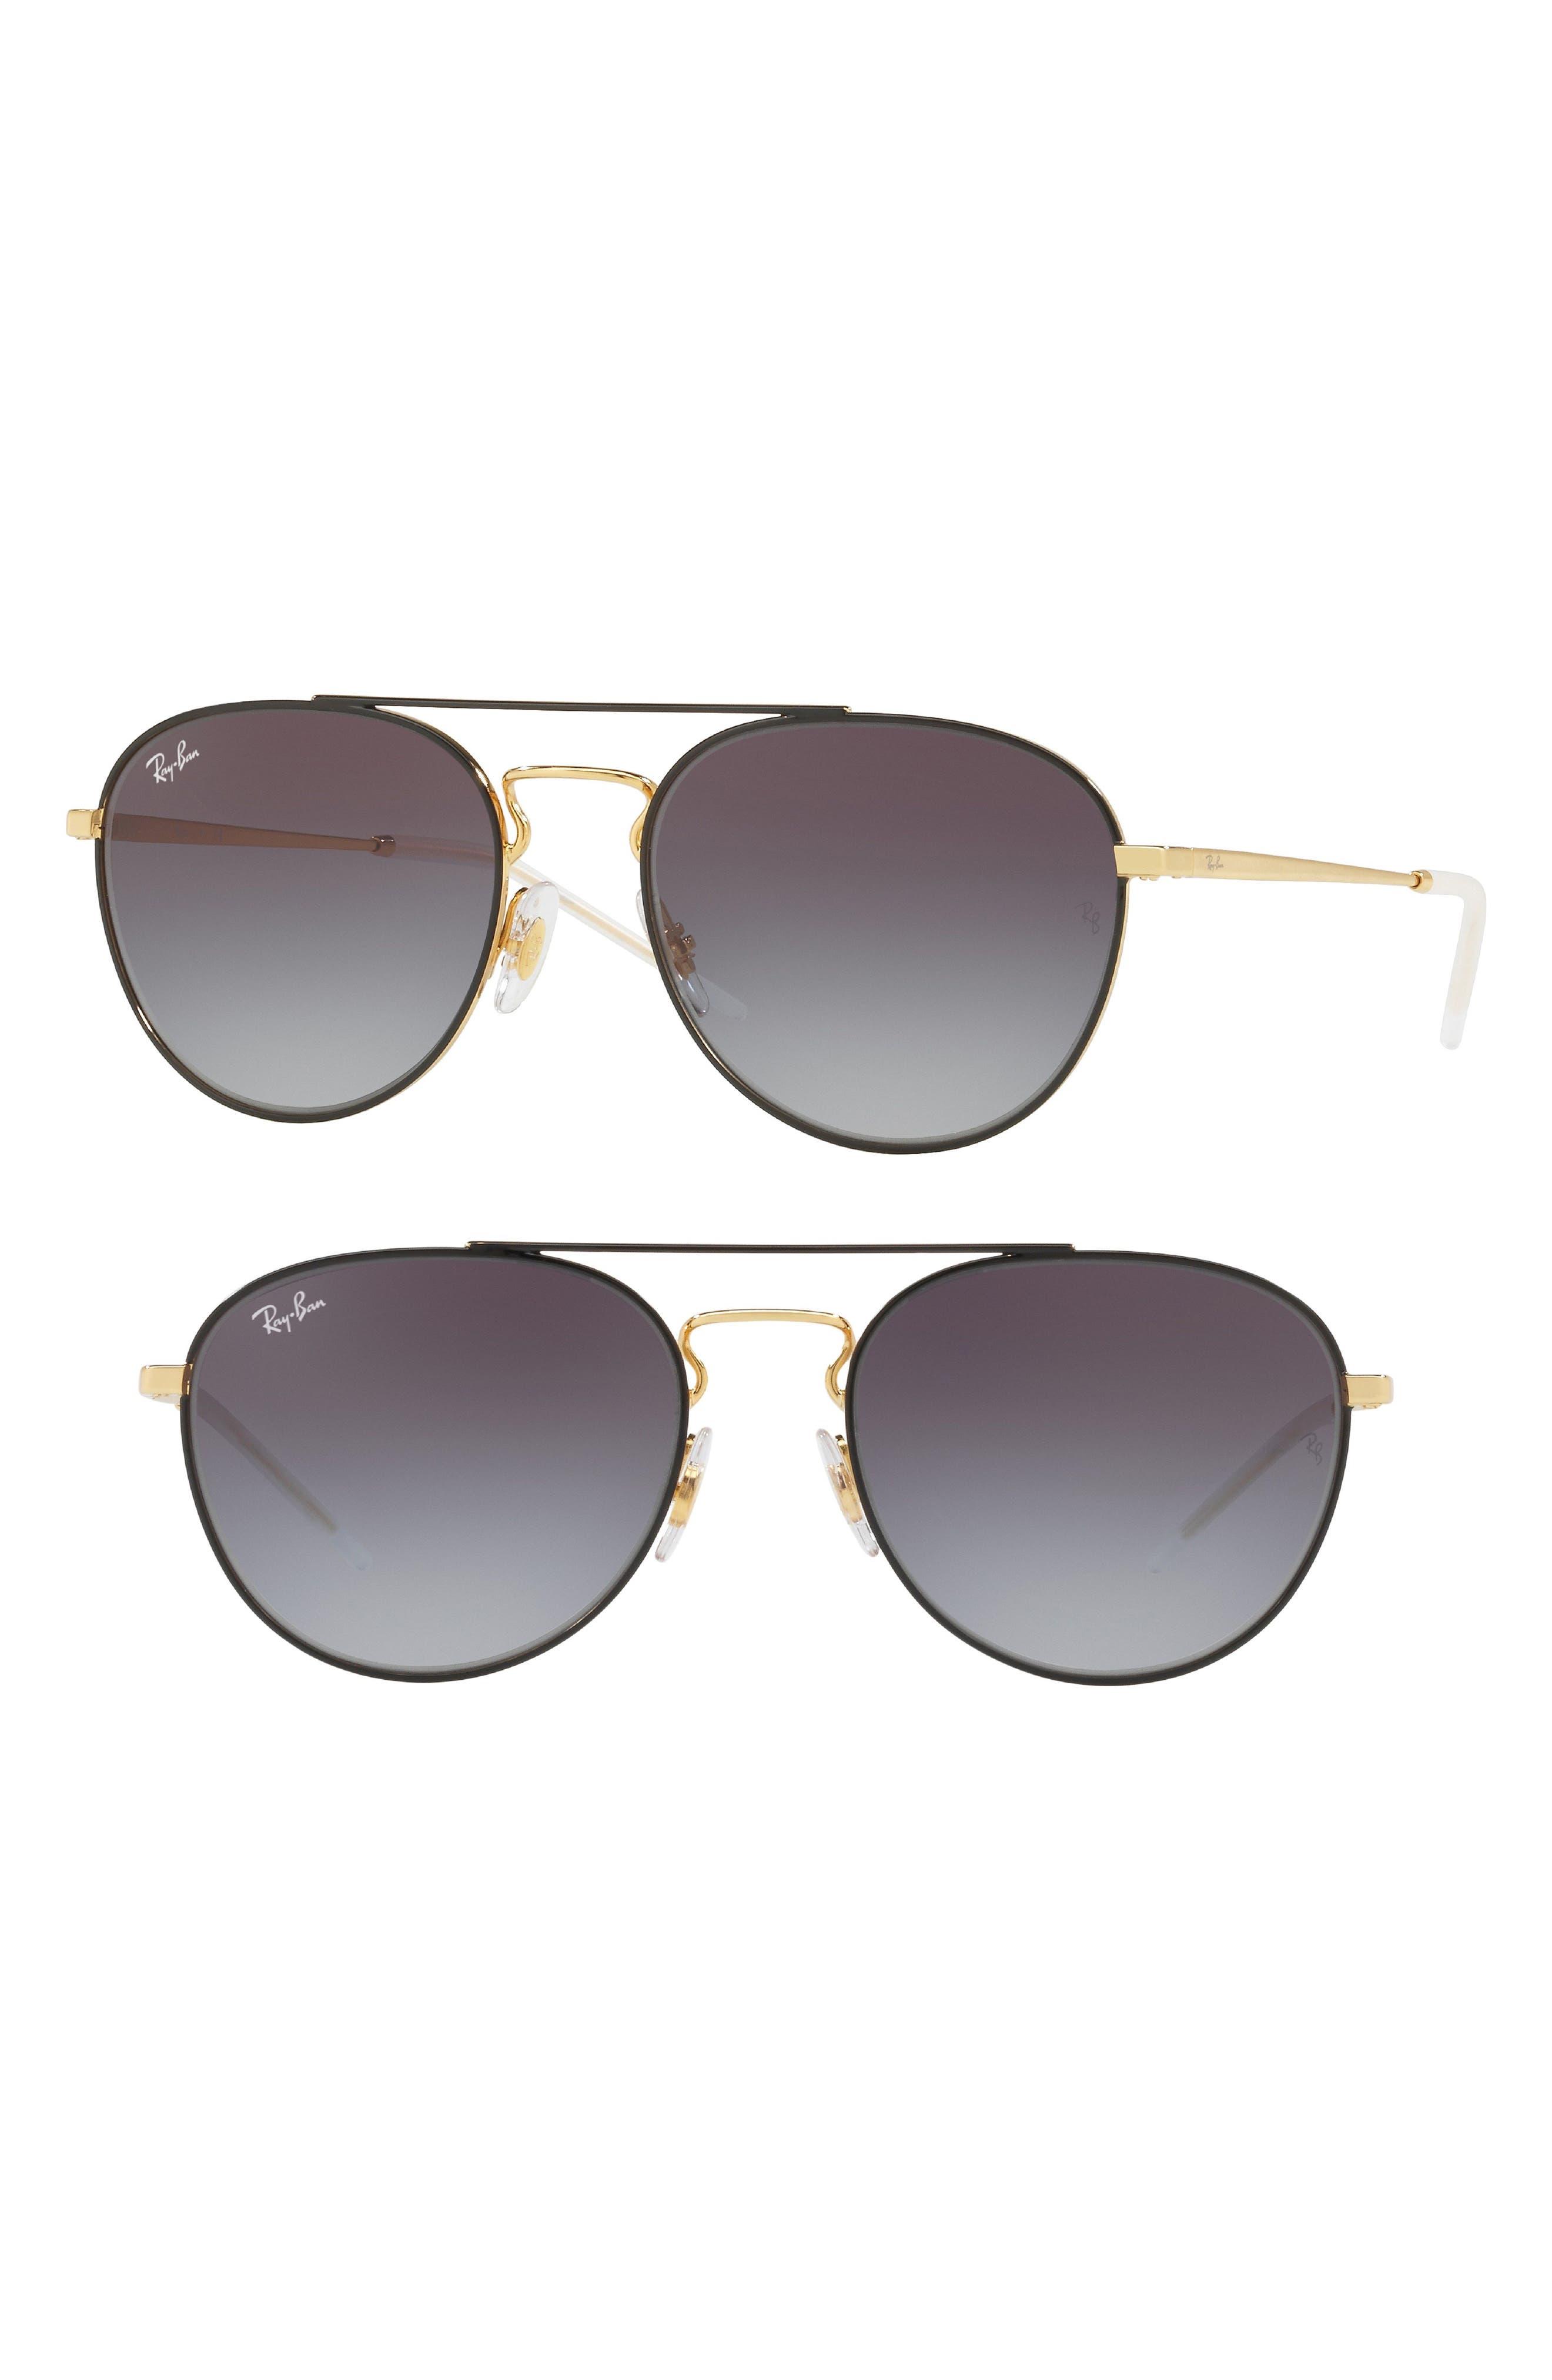 55mm Gradient Lens Round Aviator Sunglasses,                             Main thumbnail 1, color,                             001